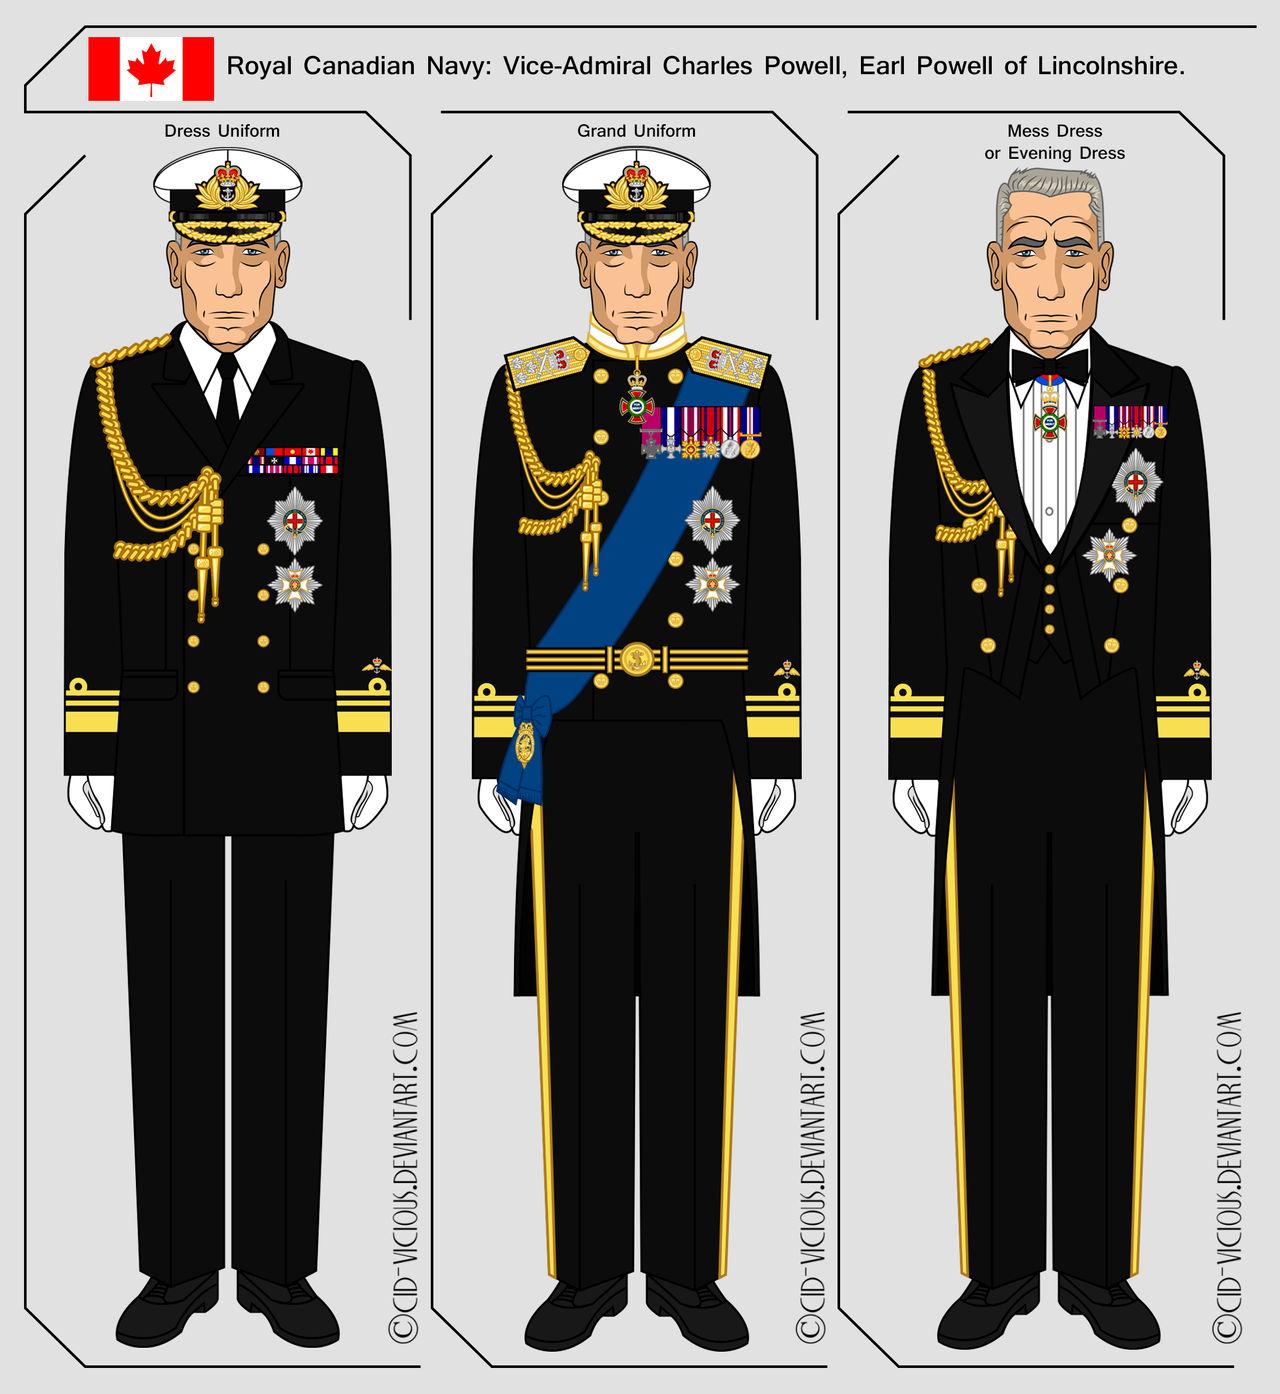 Royal Canadian Navy Dress Uniforms by Cid-Vicious on DeviantArt